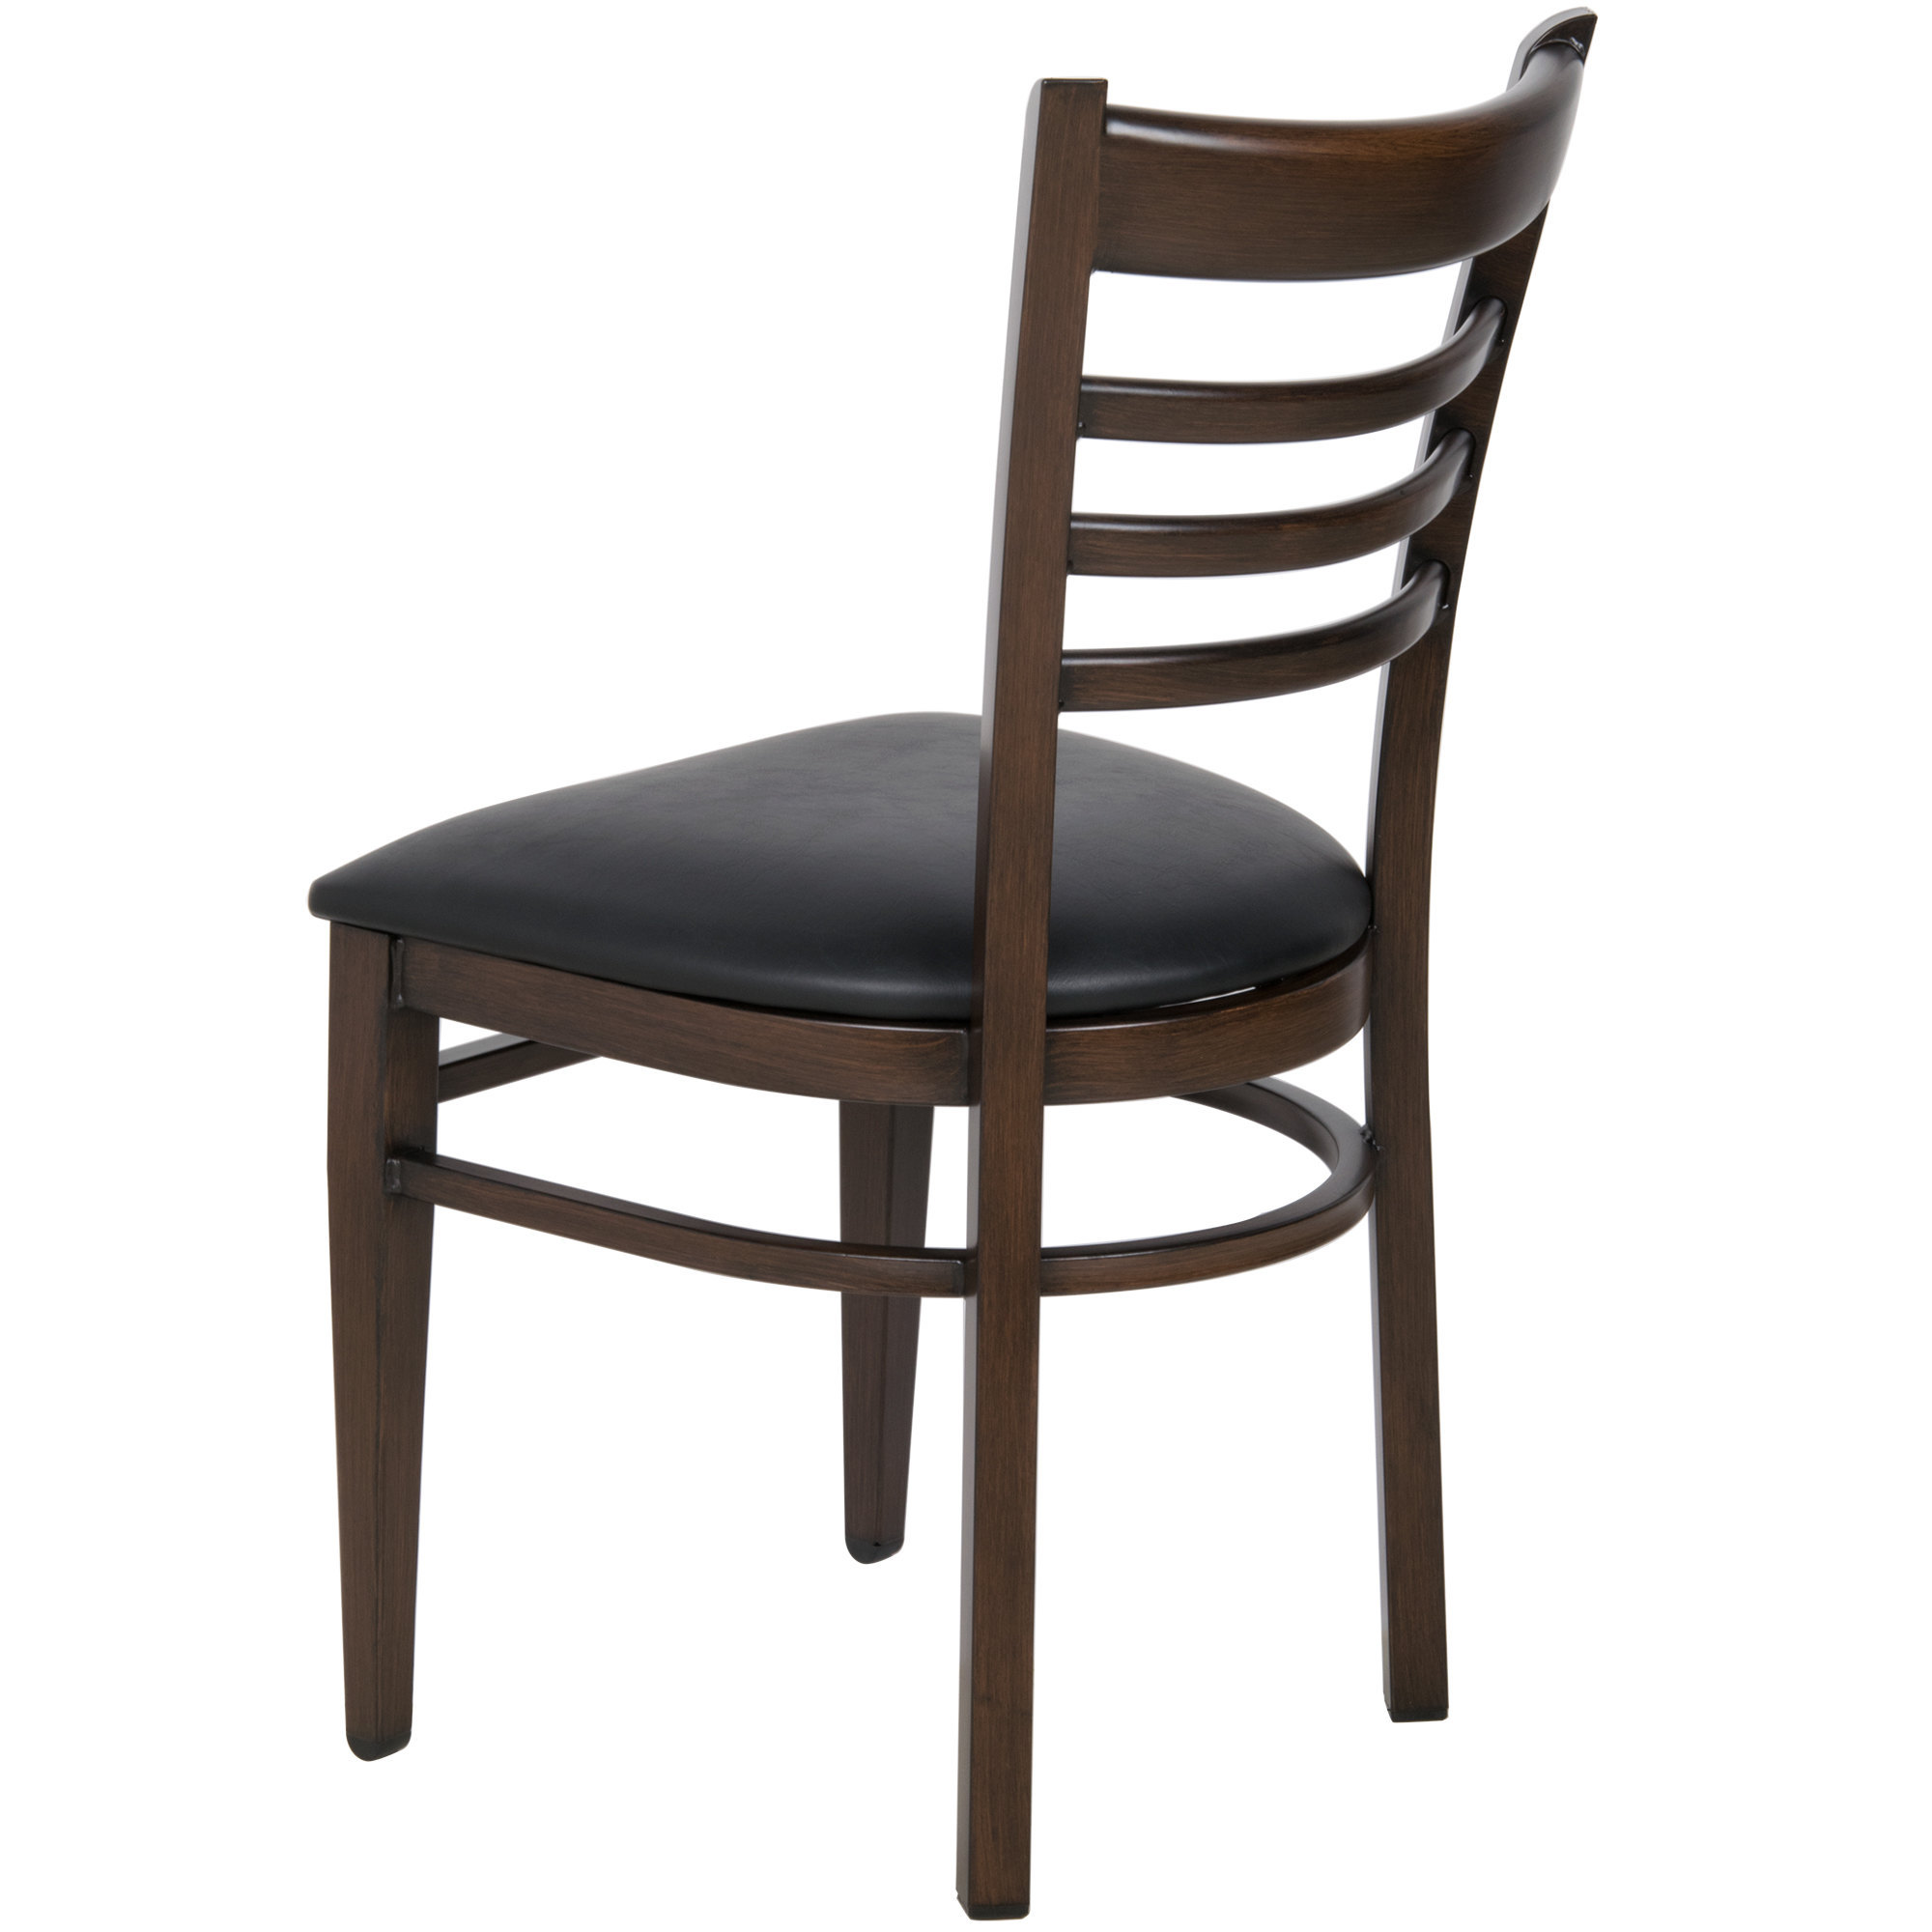 #141 - Ladder Back Design Metal Restaurant Chair with Walnut Wood Grain Finish and Black Vinyl Seat